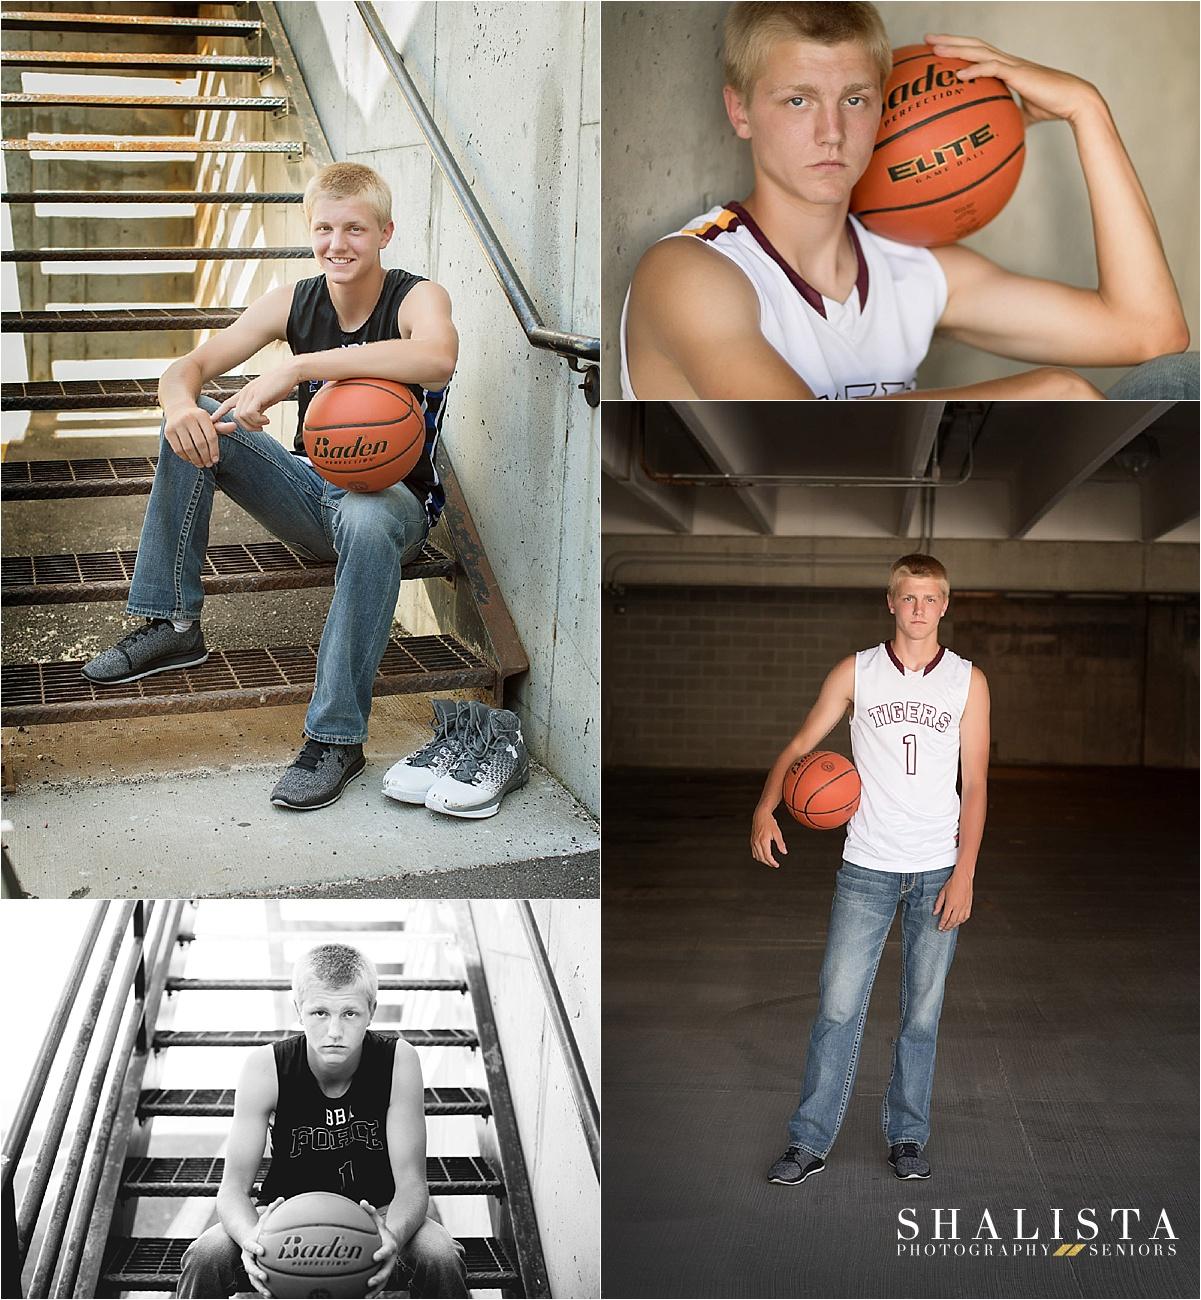 Shalista Photography - Senior Guys